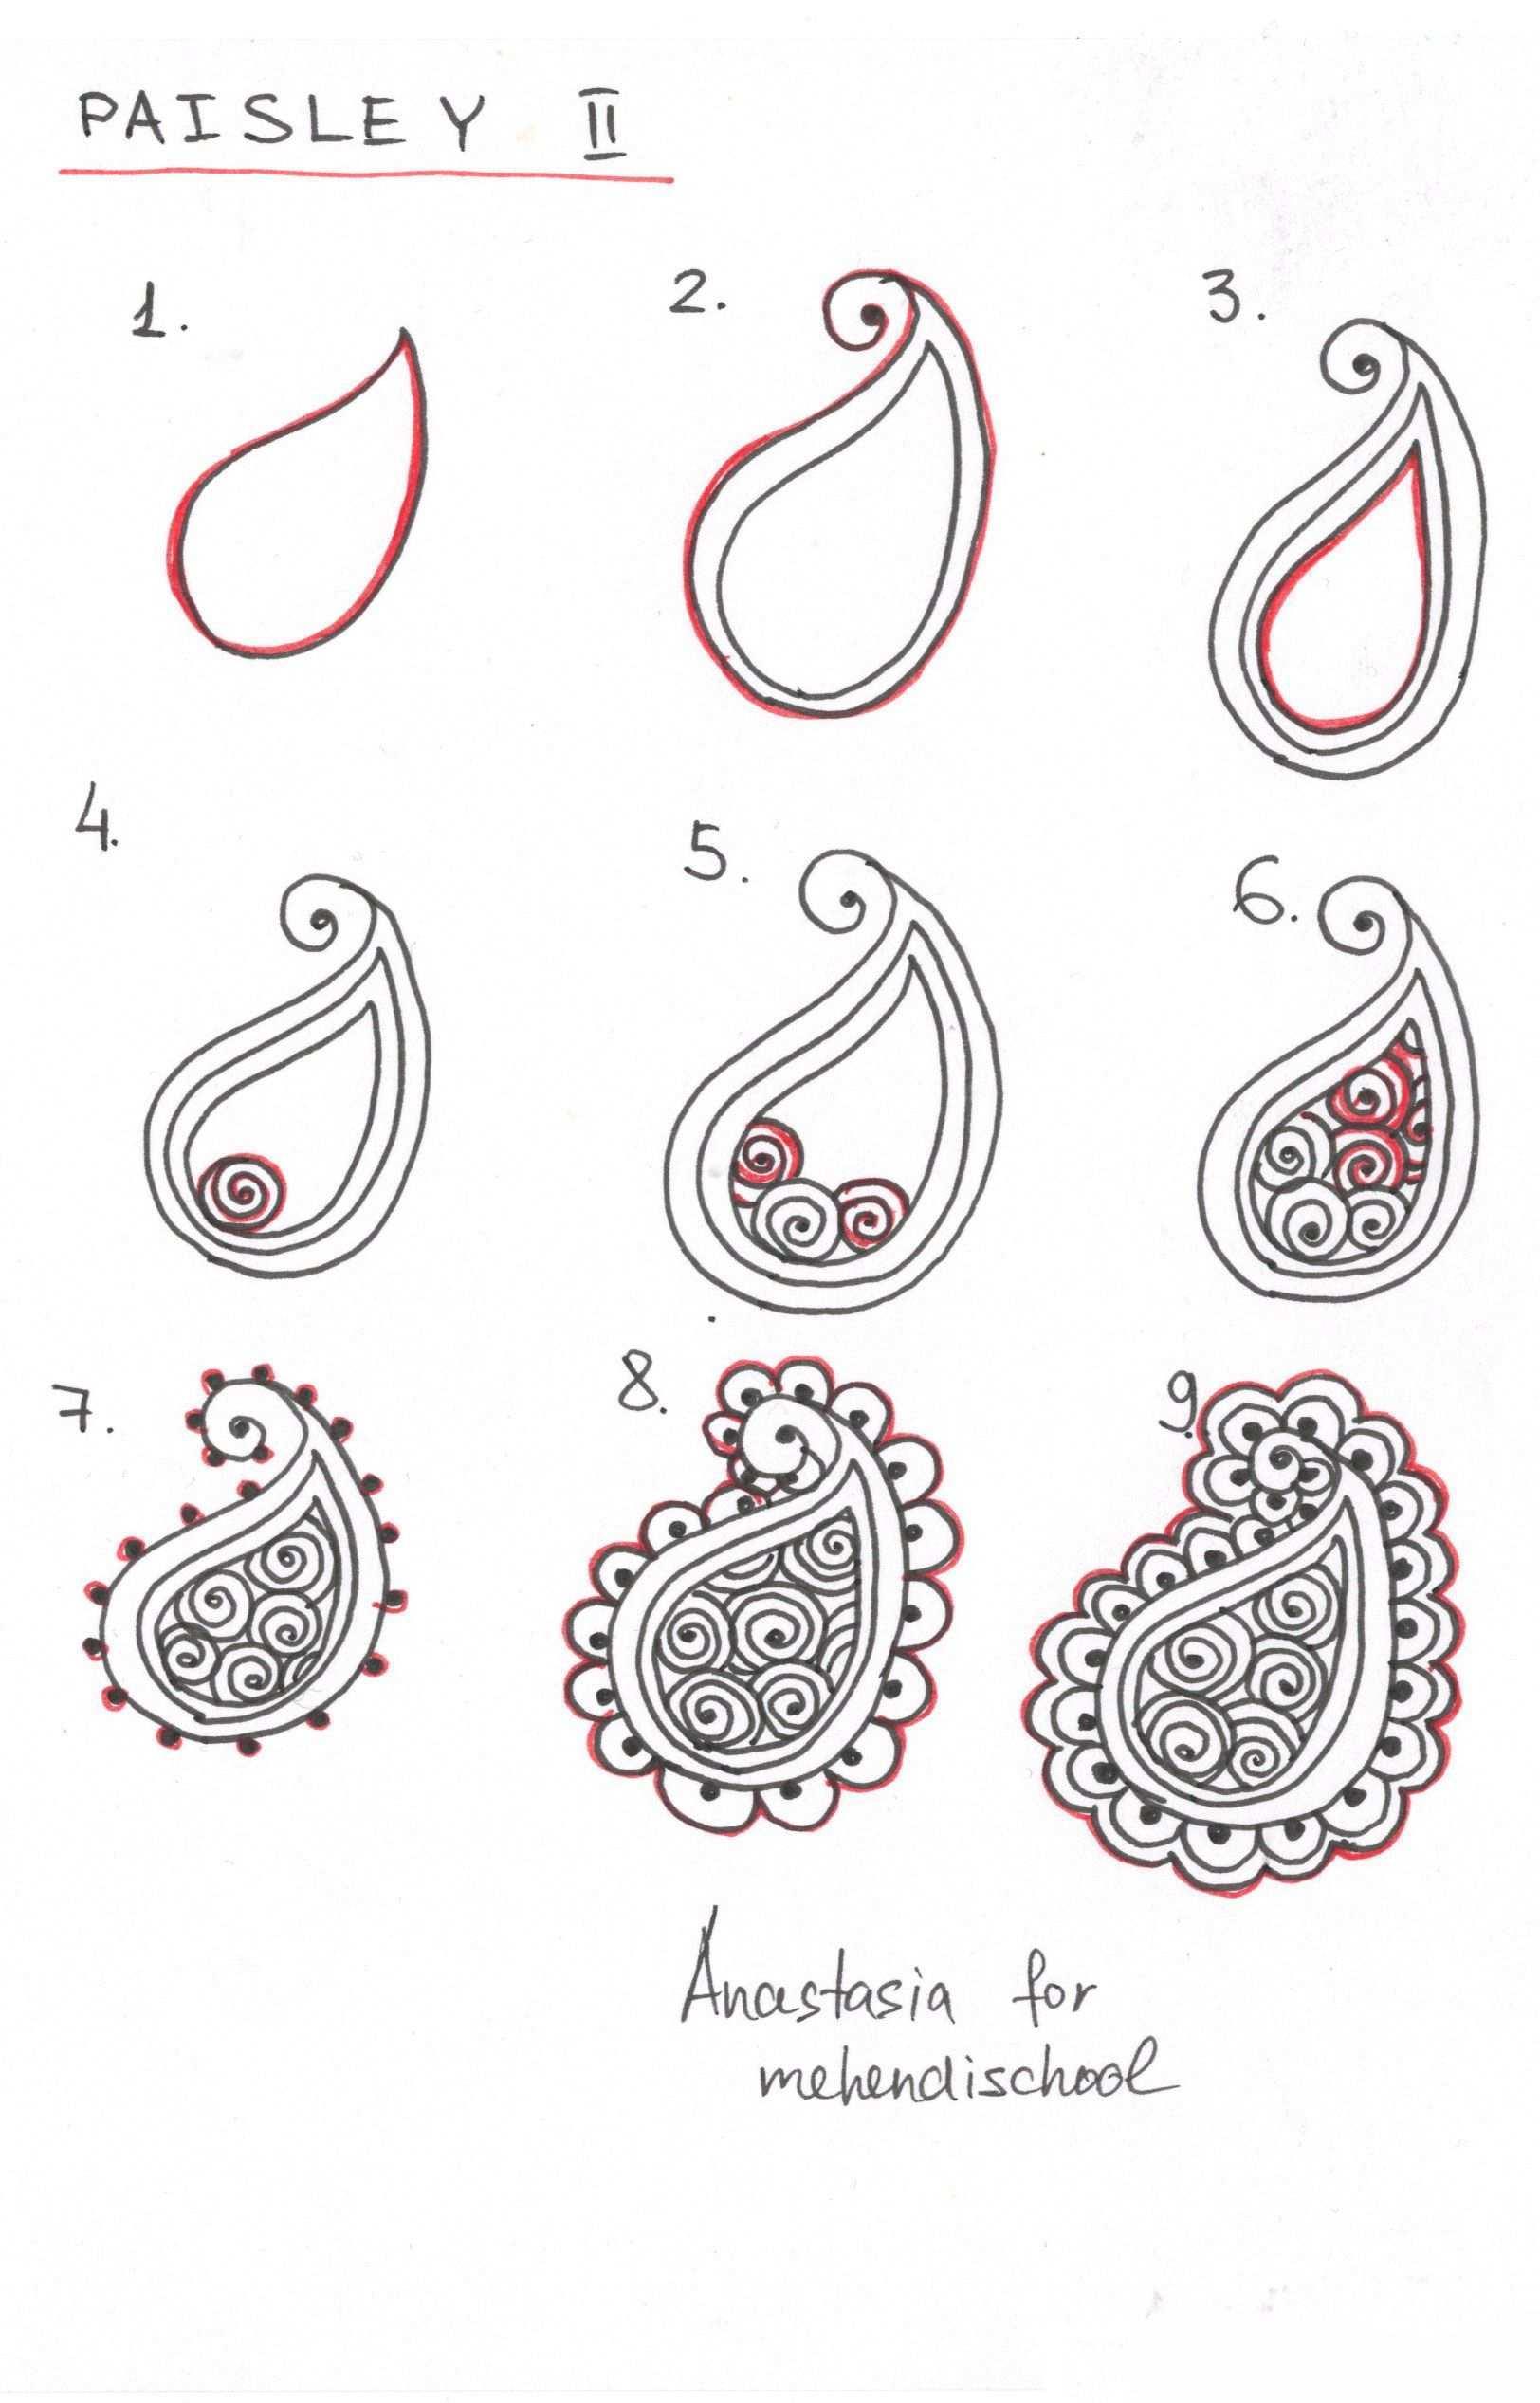 How To Draw Indian Mehndi Henna Paisley Small Tutorial Diy Henna Drawings Zentangle Patterns Henna Tutorial